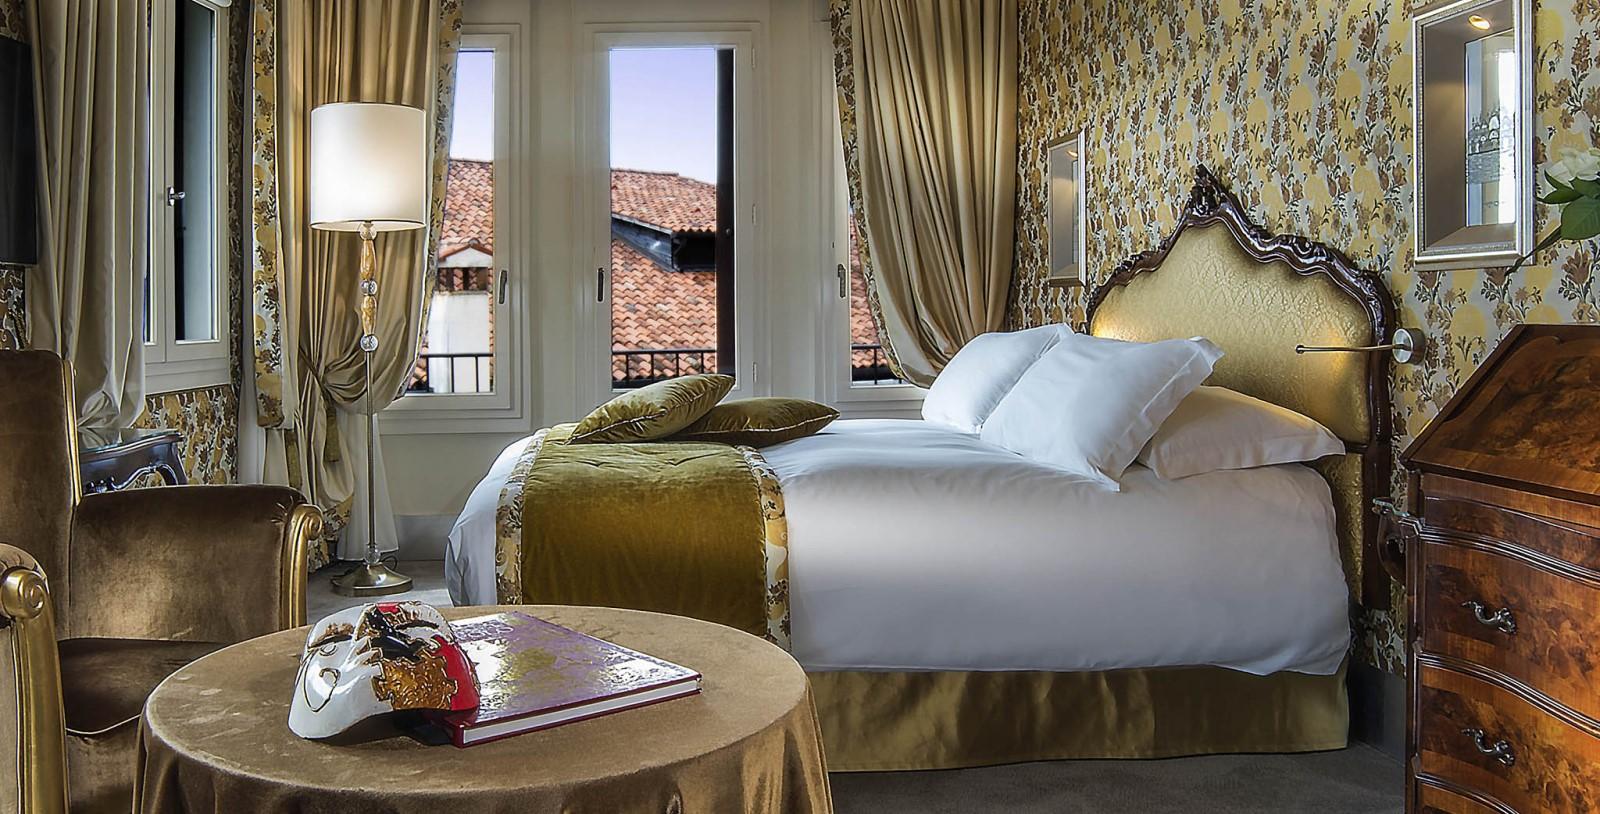 Image of Guestroom Interior, Hotel Papadopoli Venezia - MGallery by Sofitel, Venice, Italy ,1700s, Member of Historic Hotels Worldwide, Accommodations